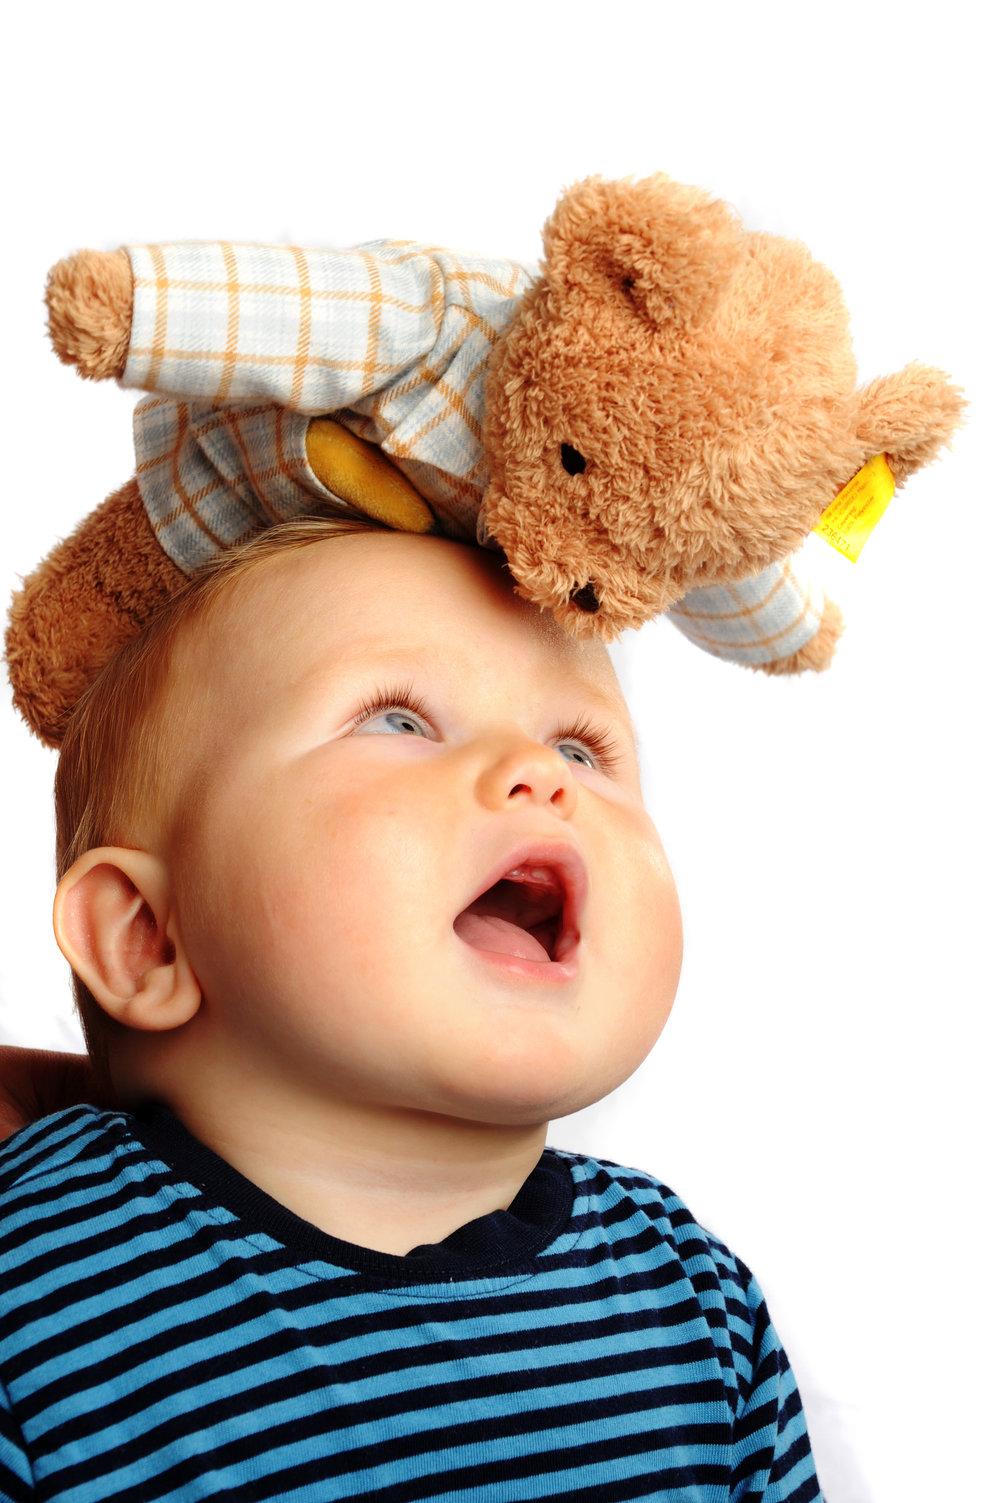 teddy-balanced-baby-head-jma-photo.JPG